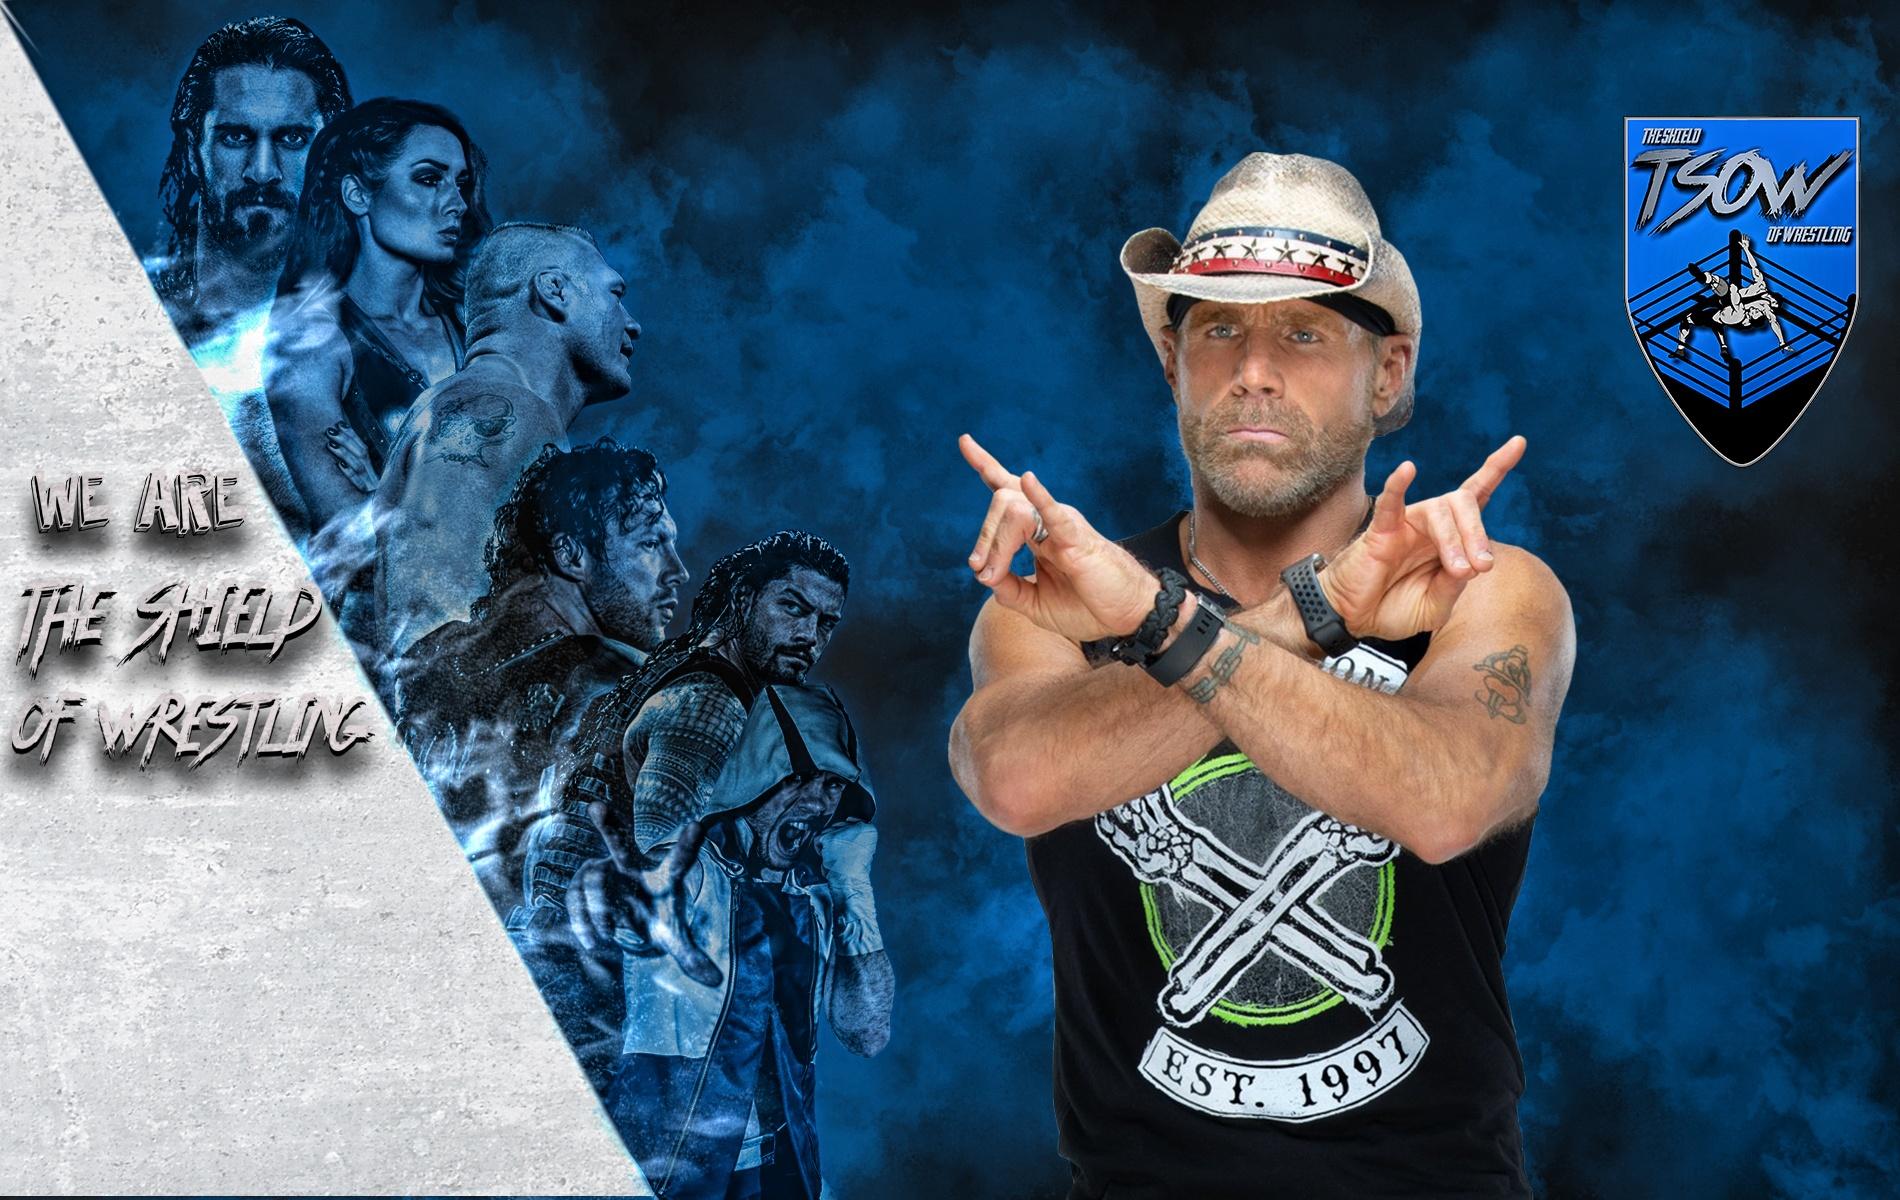 Shawn Michaels parla - Rivalità tra WWE ed AEW